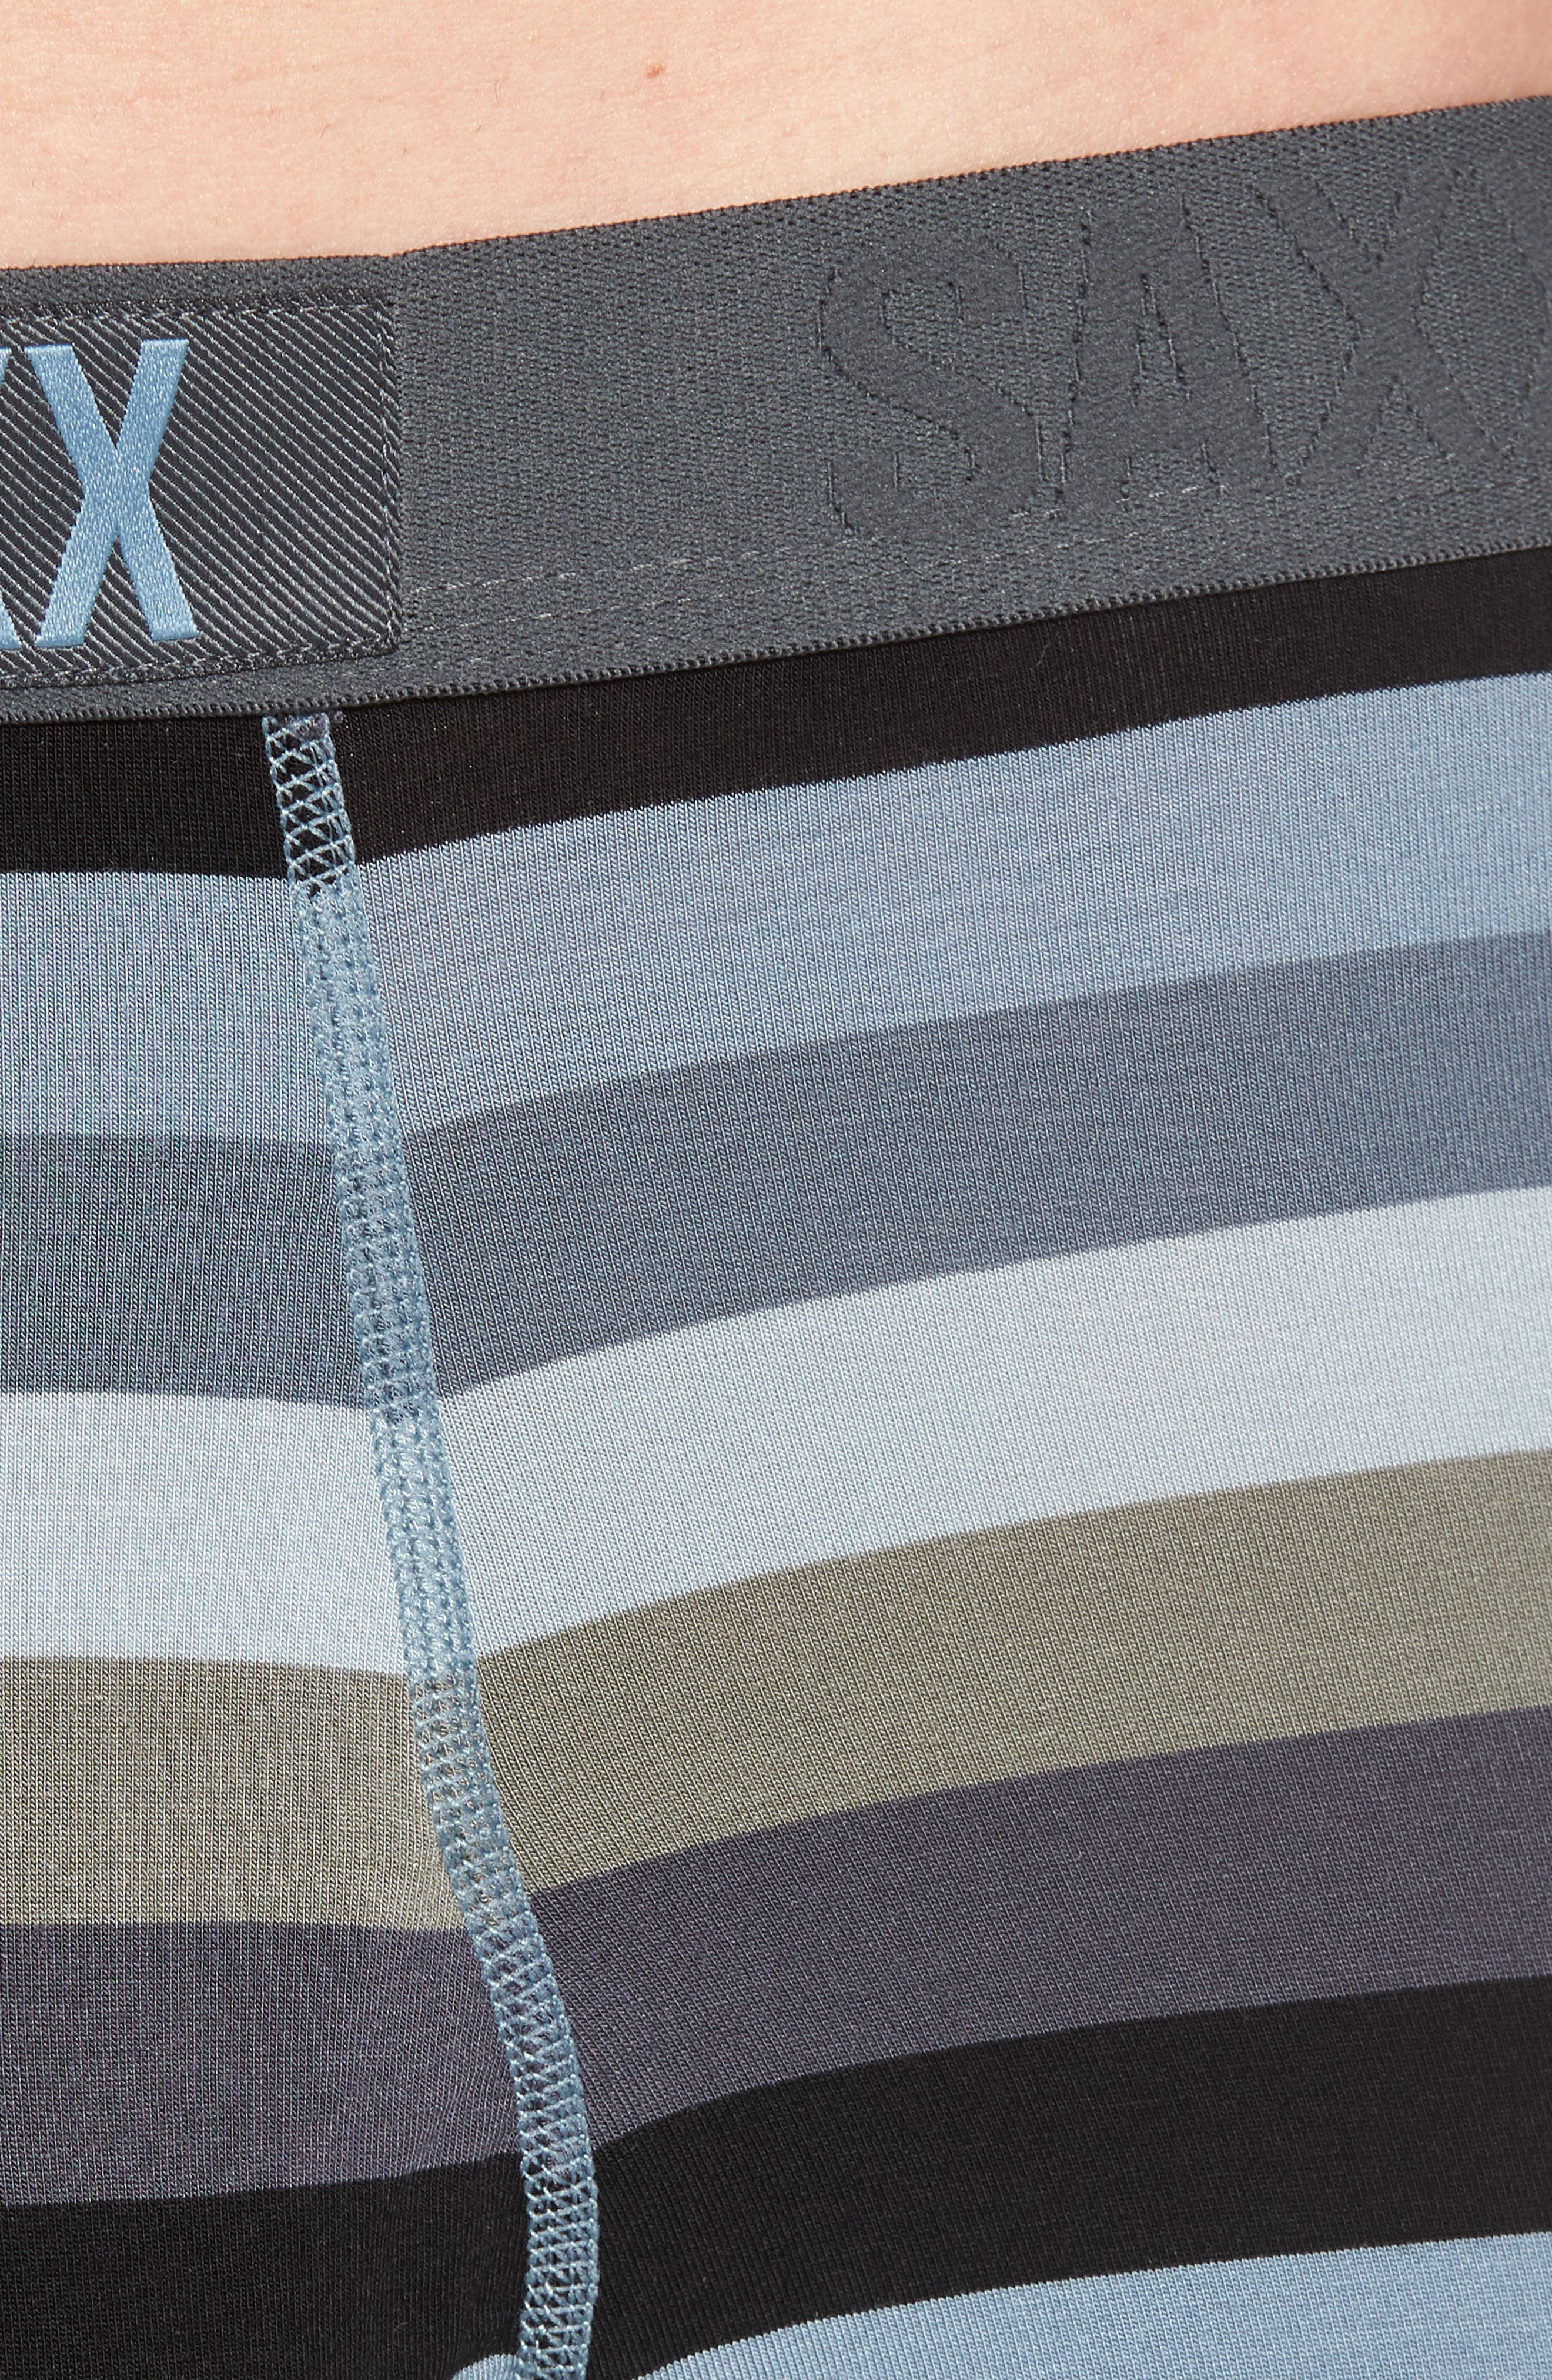 Stripe Boxer Brief,                             Alternate thumbnail 4, color,                             Dark Charcoal Stripe